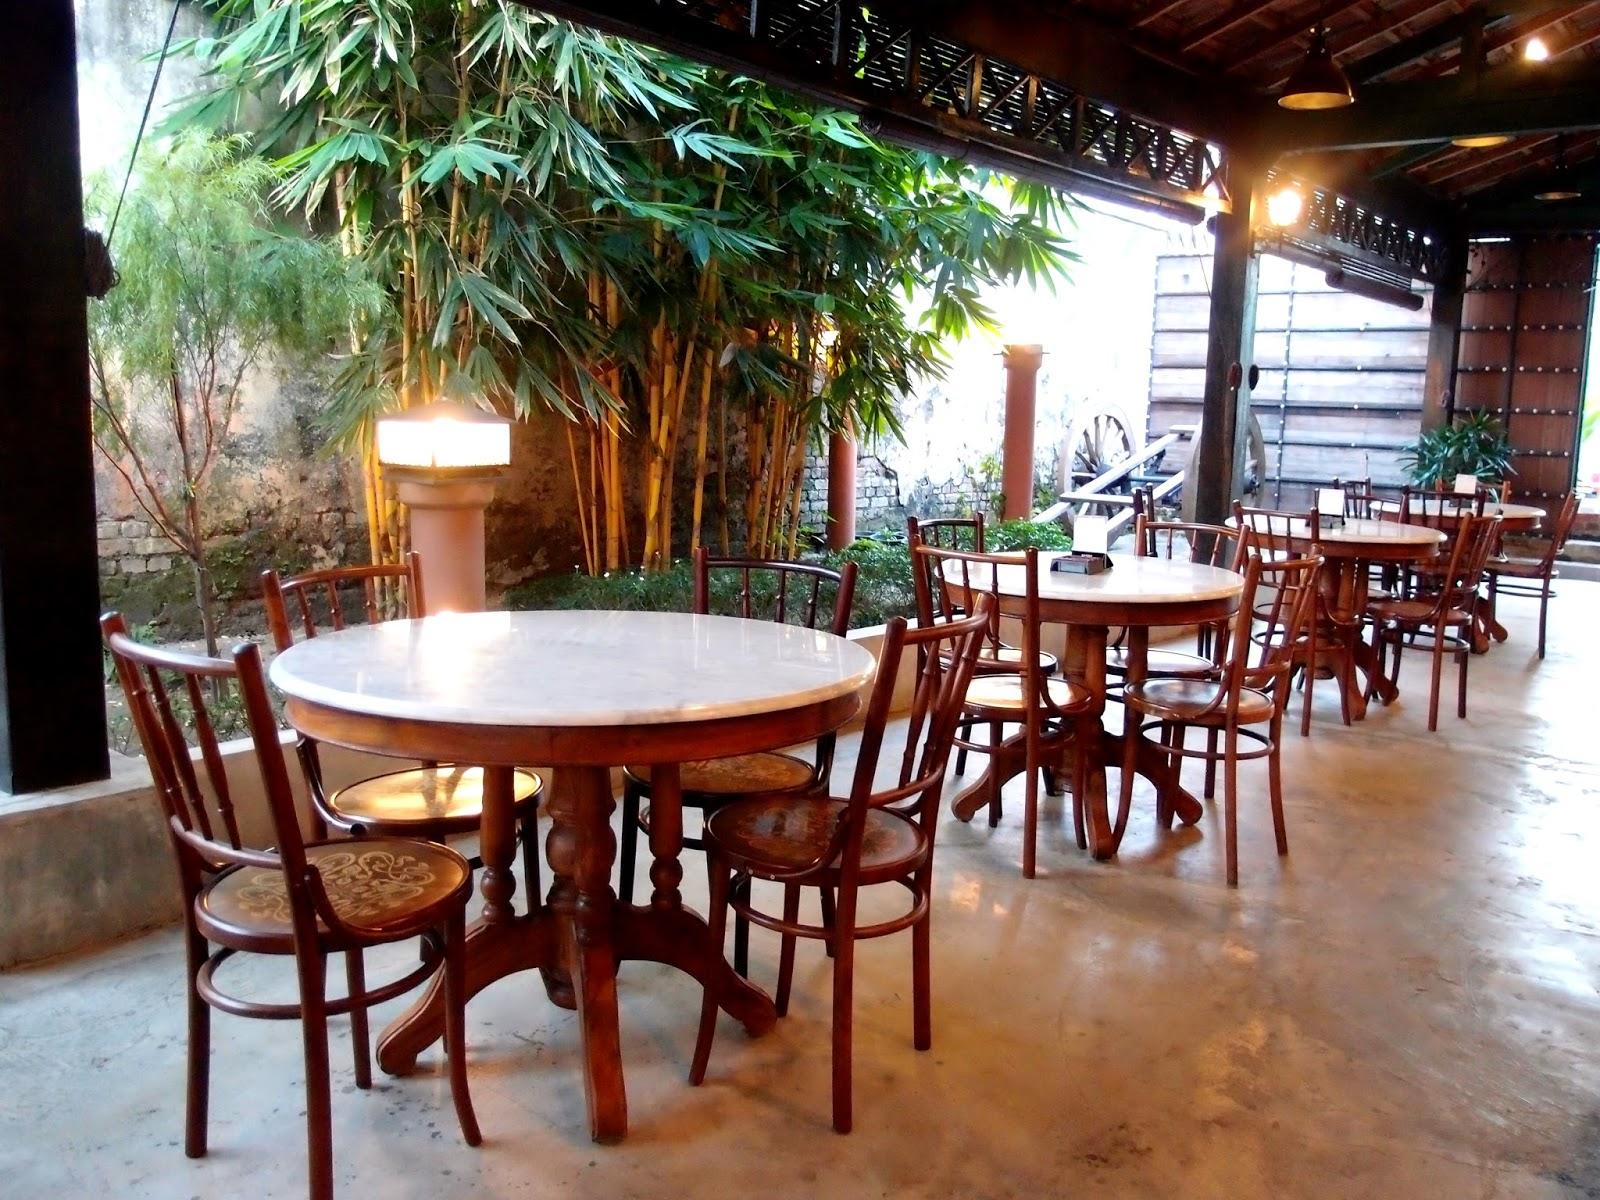 Malaya Hainan Restaurant Petaling Street Chinatown Kuala Lumpur